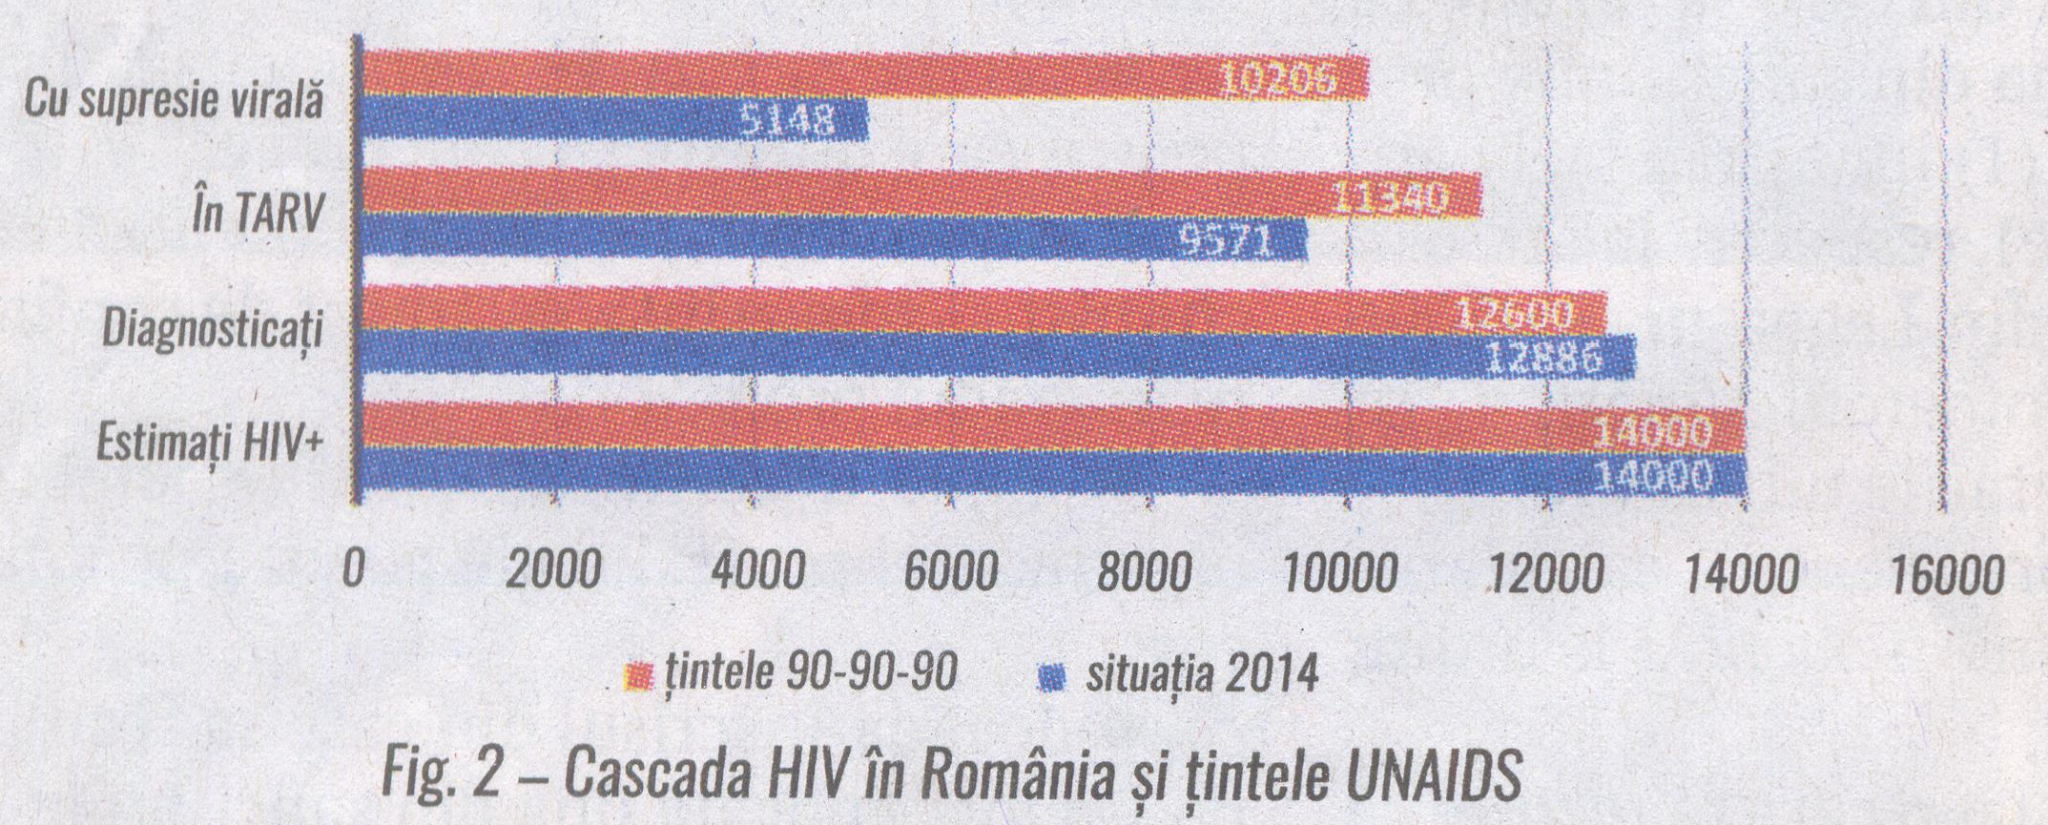 Fig. 2 cascada HIV in Romania si tintele UNAIDS